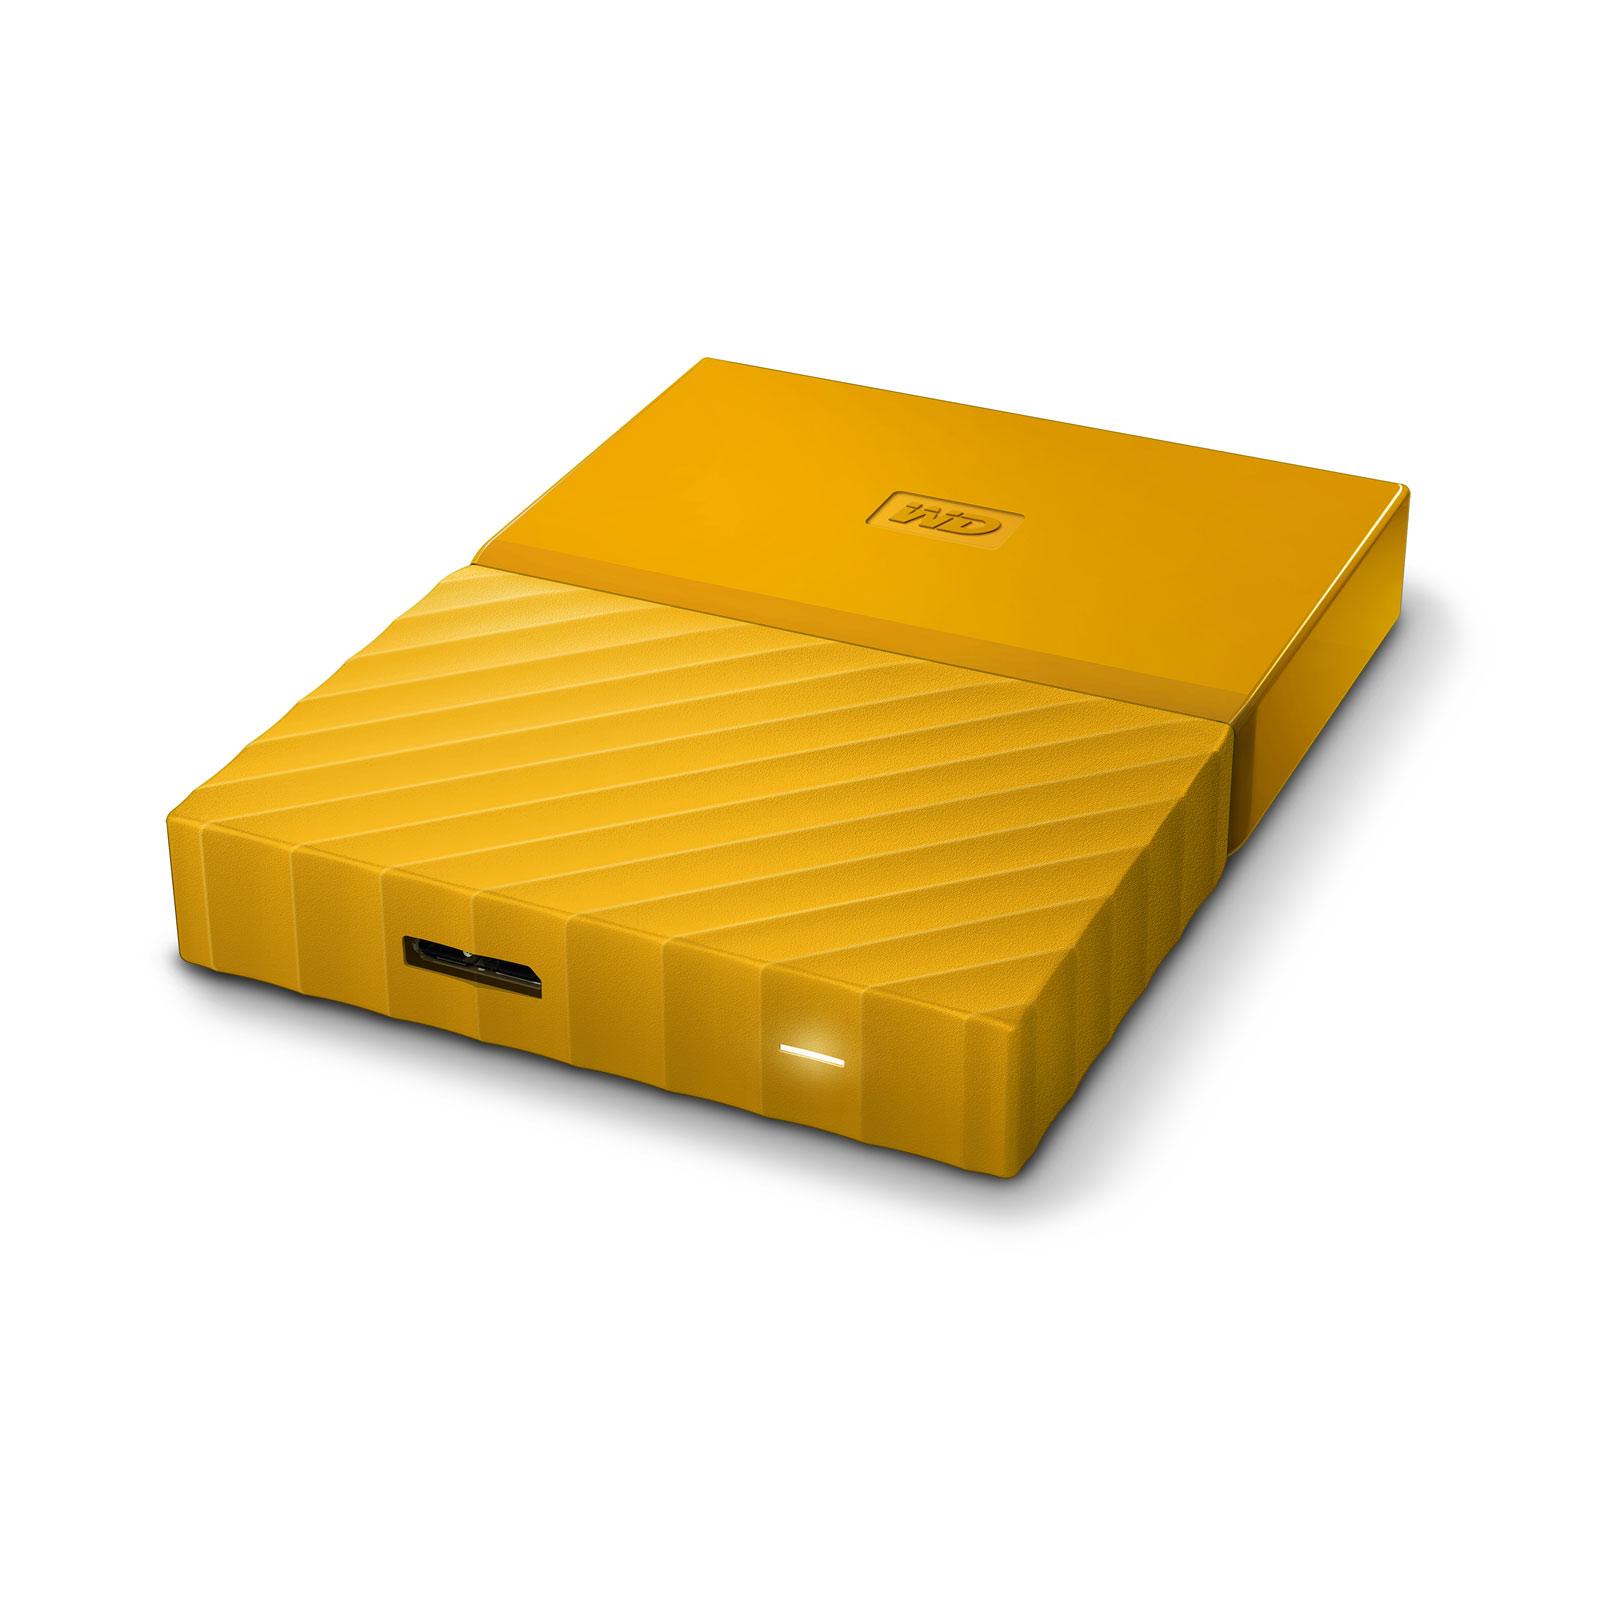 wd my passport 2 to jaune usb 3 0 disque dur externe western digital sur. Black Bedroom Furniture Sets. Home Design Ideas